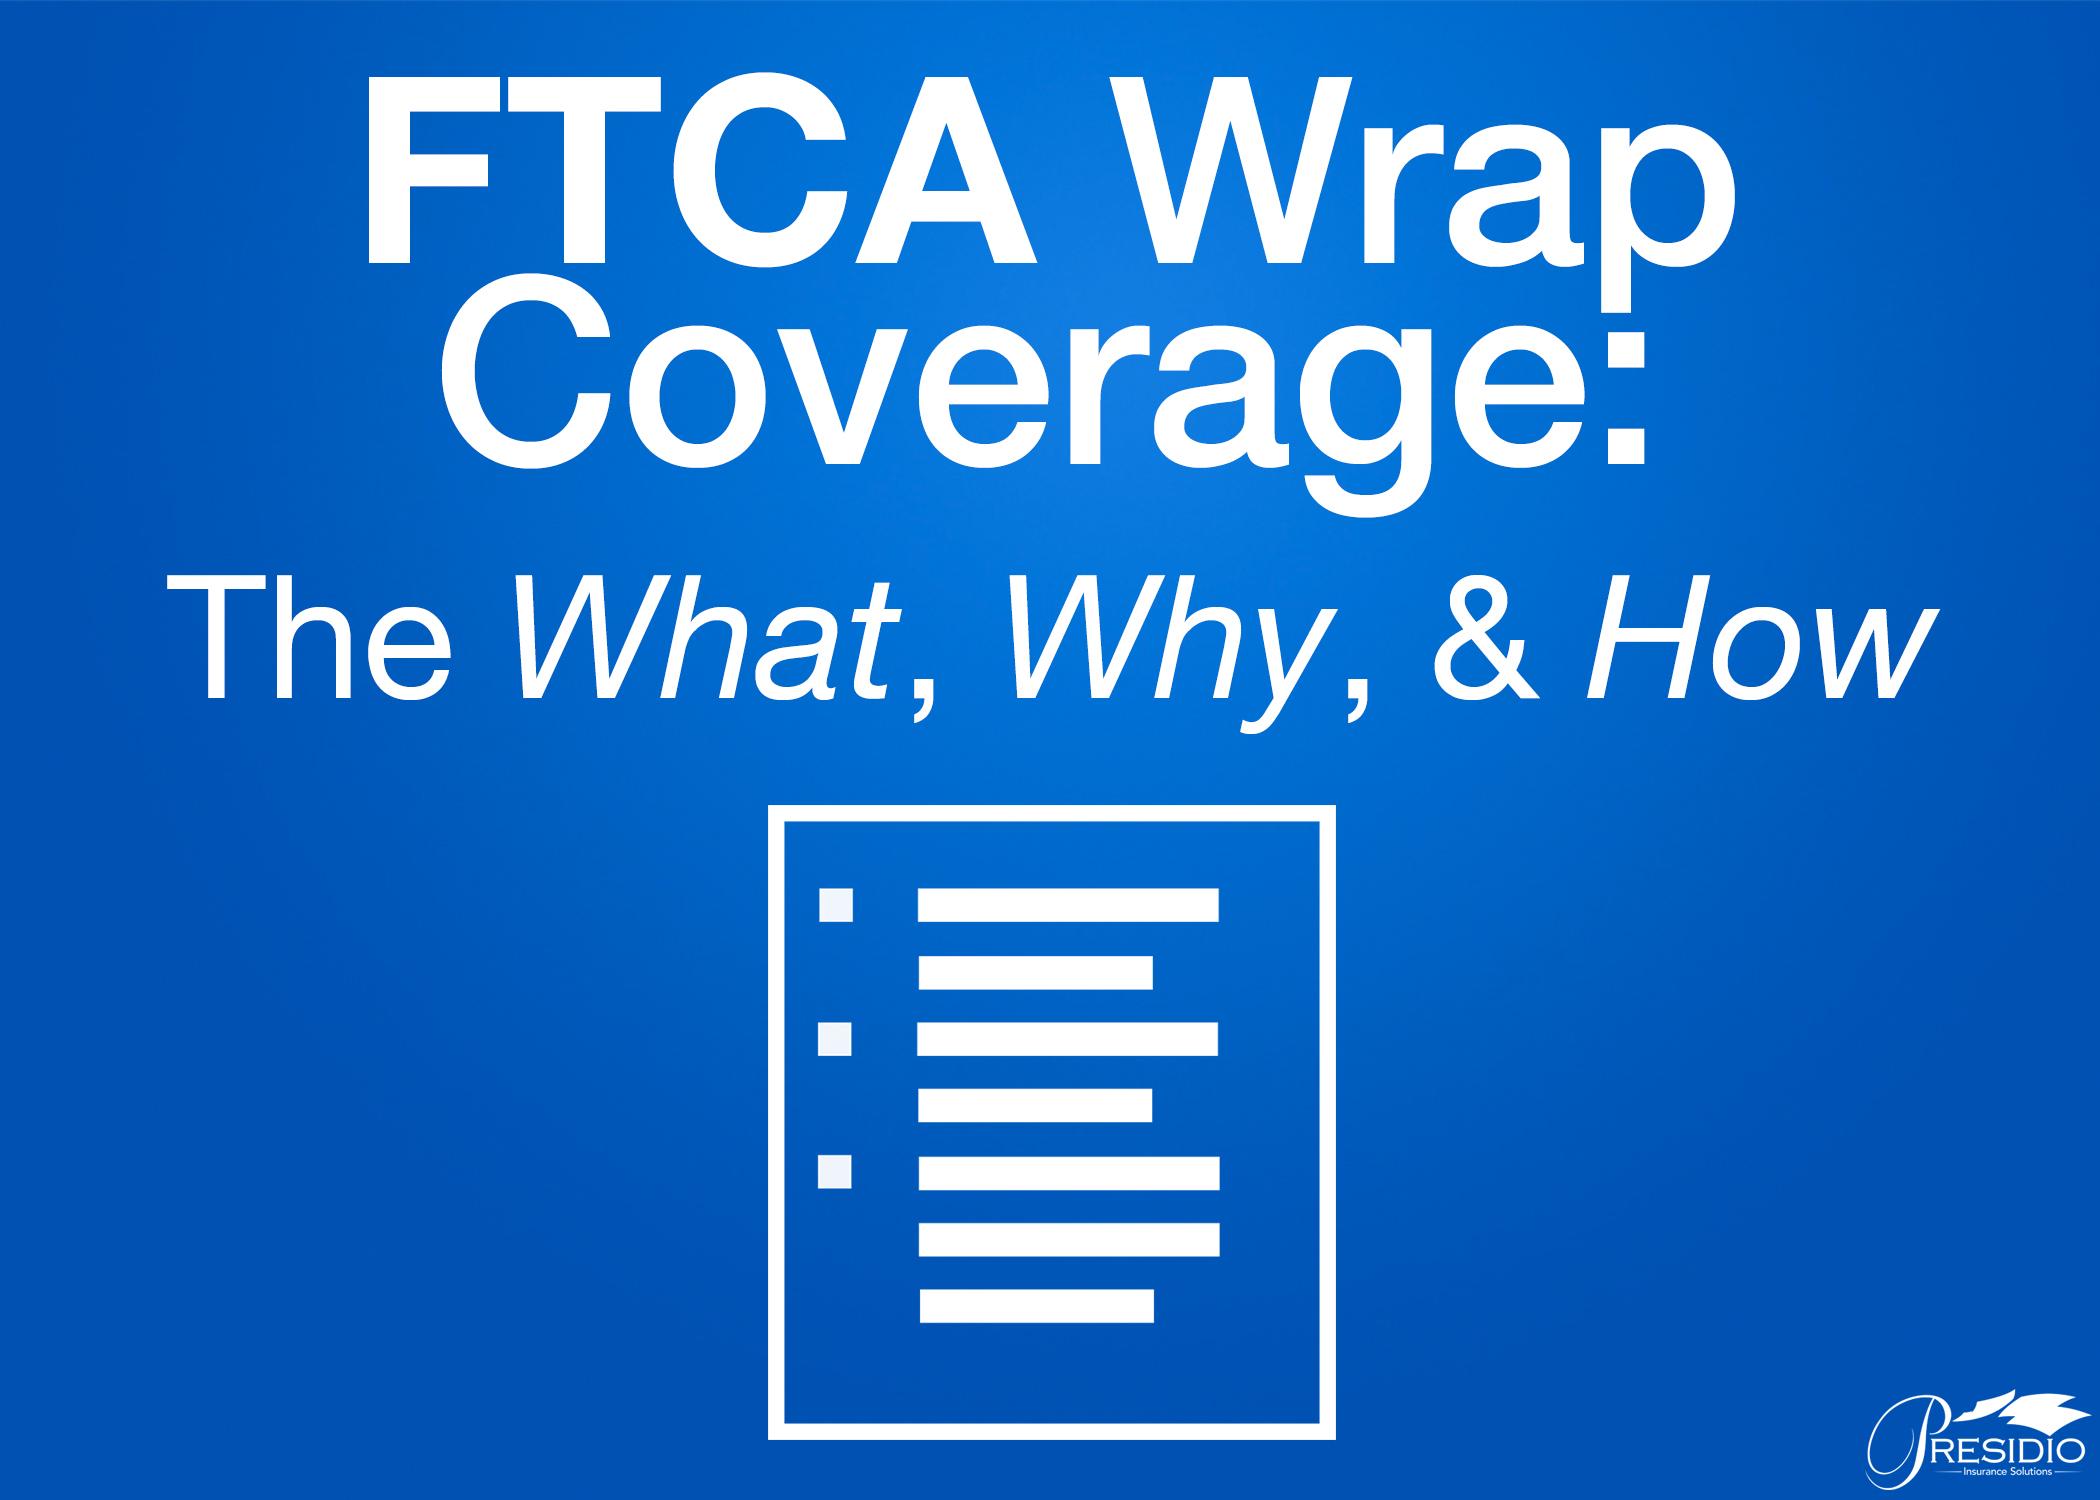 FTCA Wrap Coverage